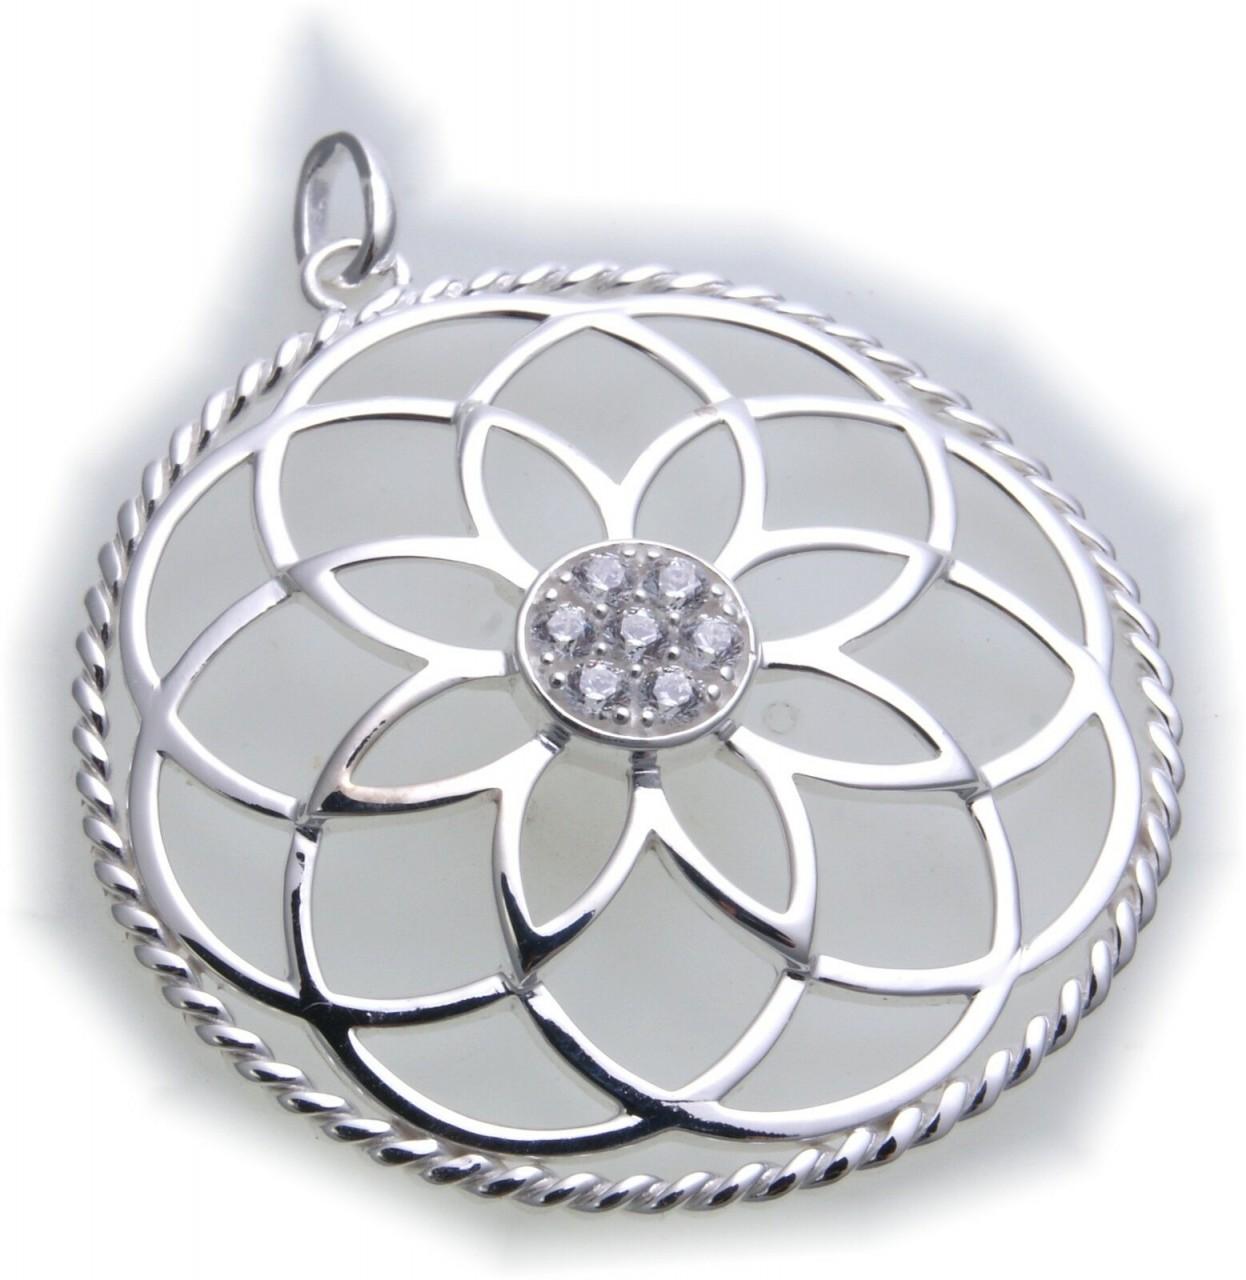 Anhänger Blume des Lebens in echt Silber 925 Sterlingsilber mit Zirkonia